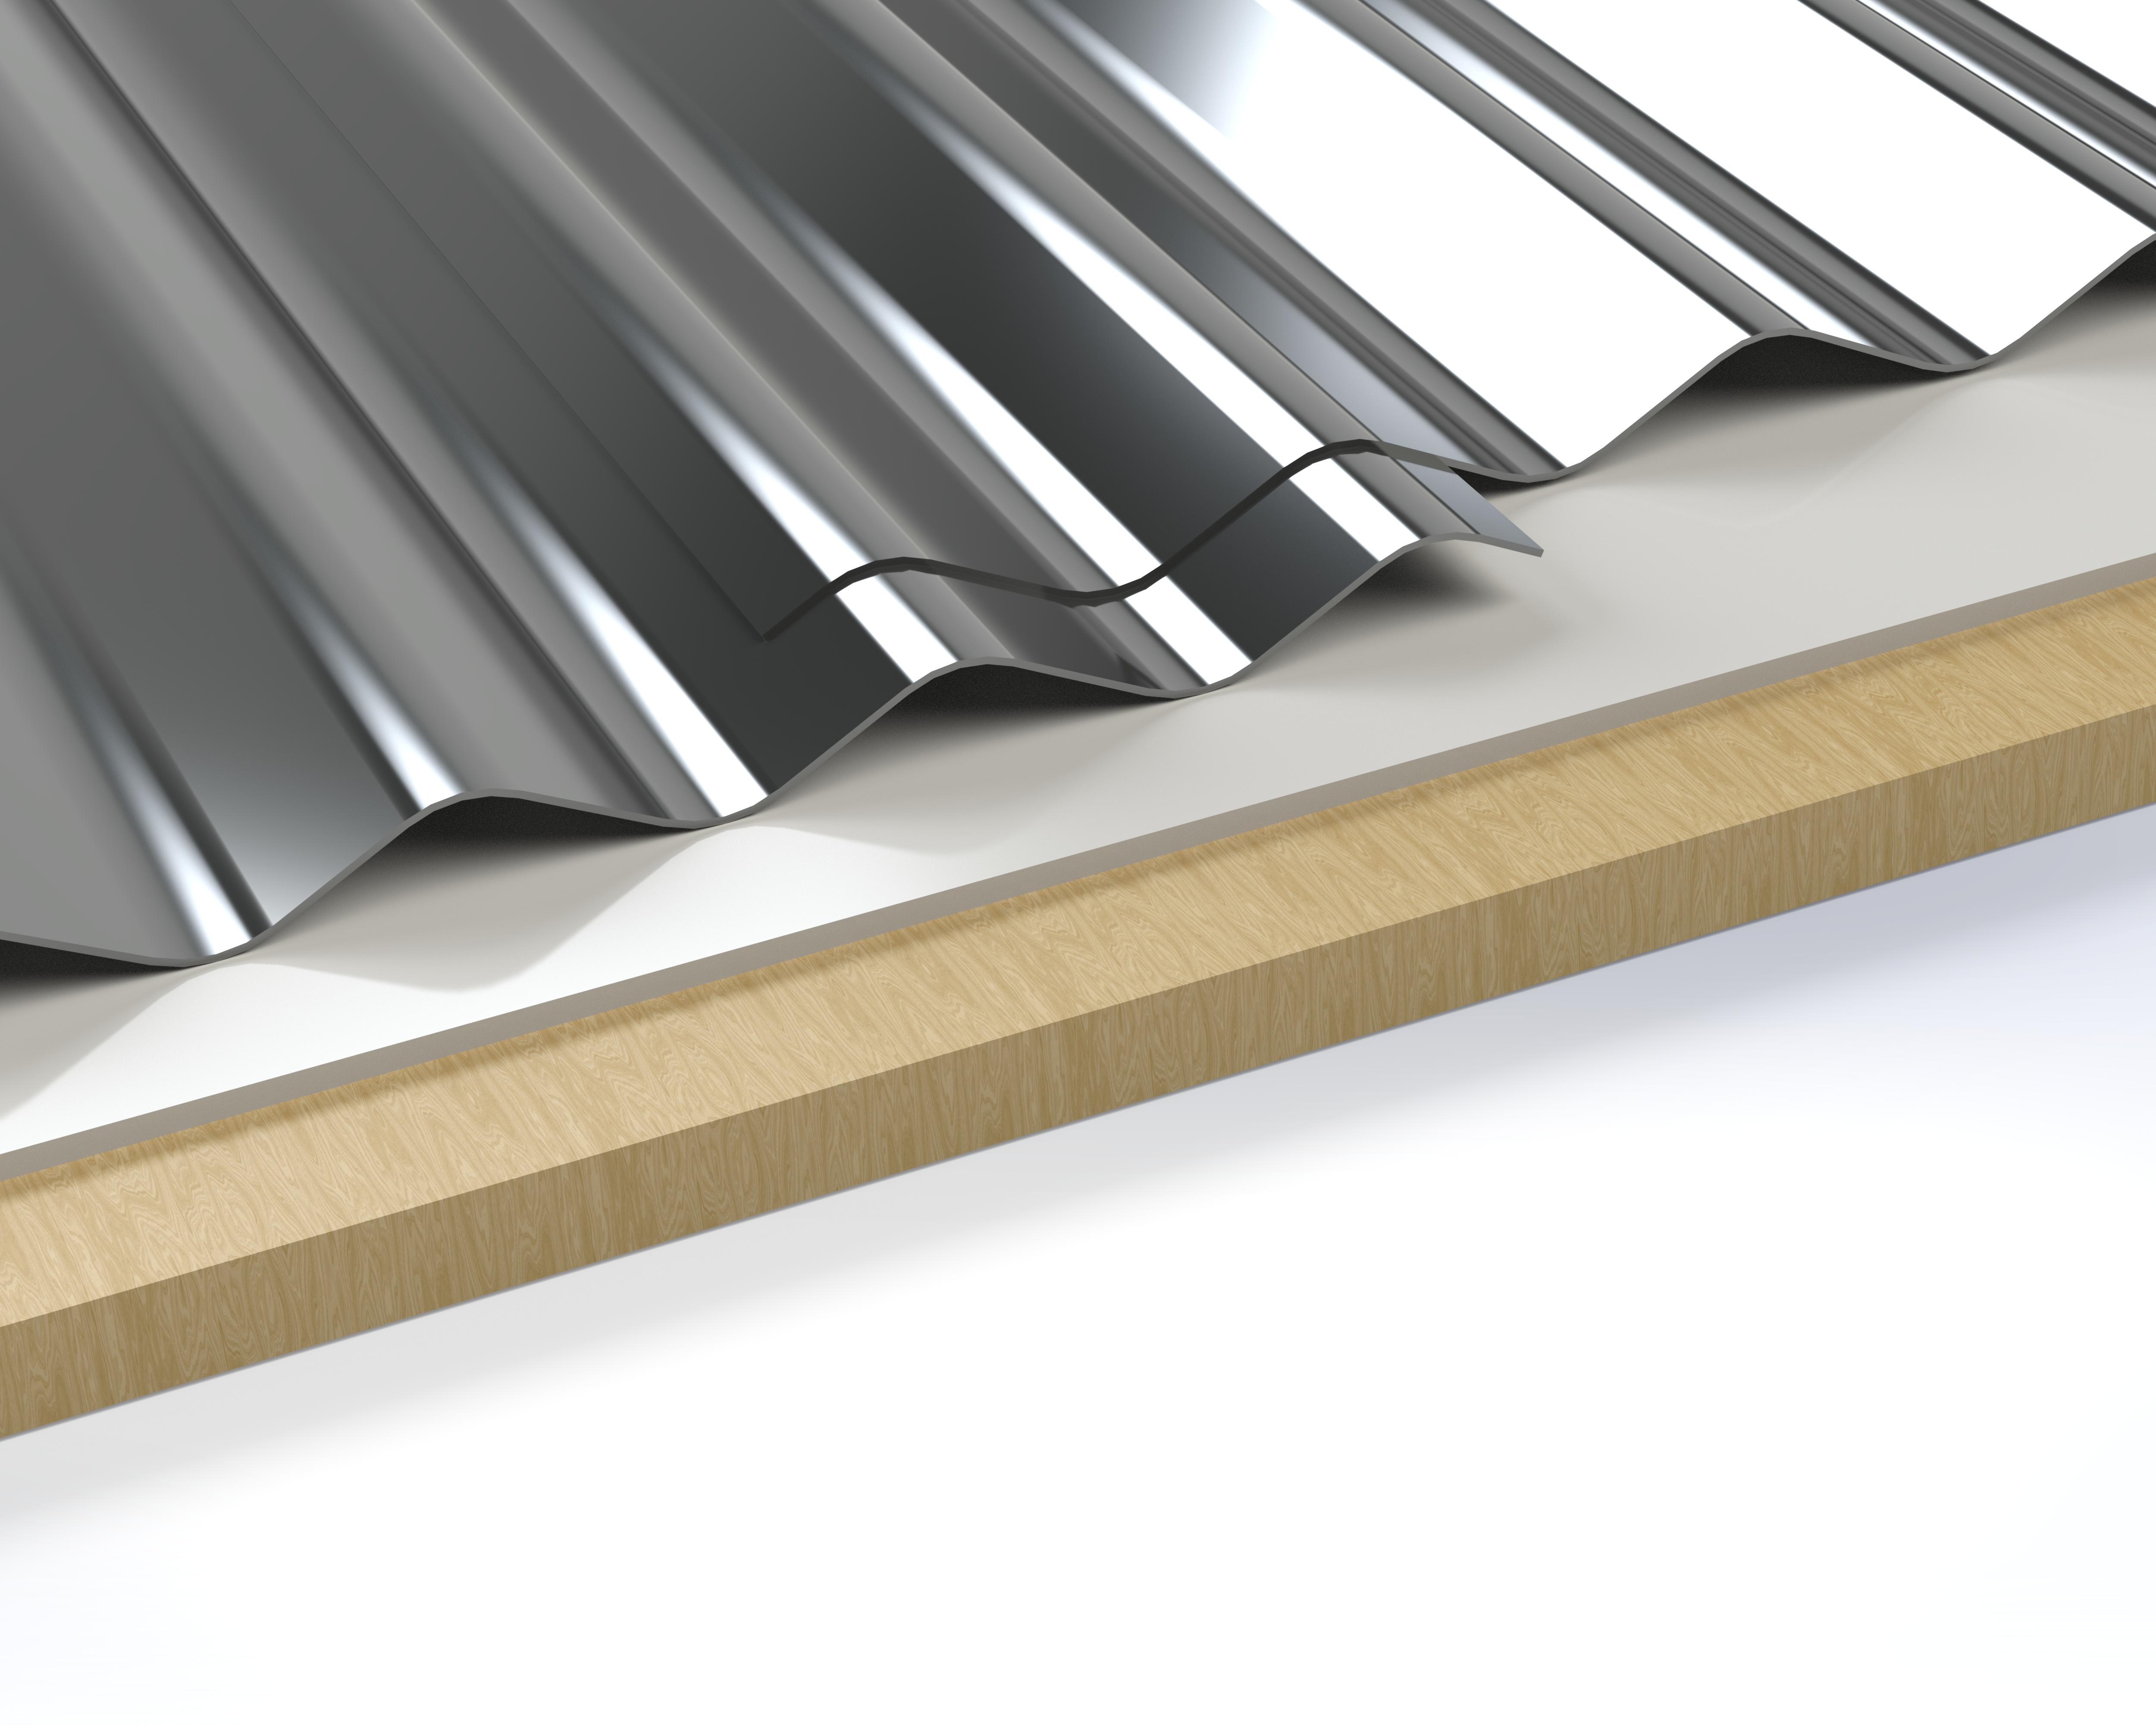 Quarter Inches Corrugated Install